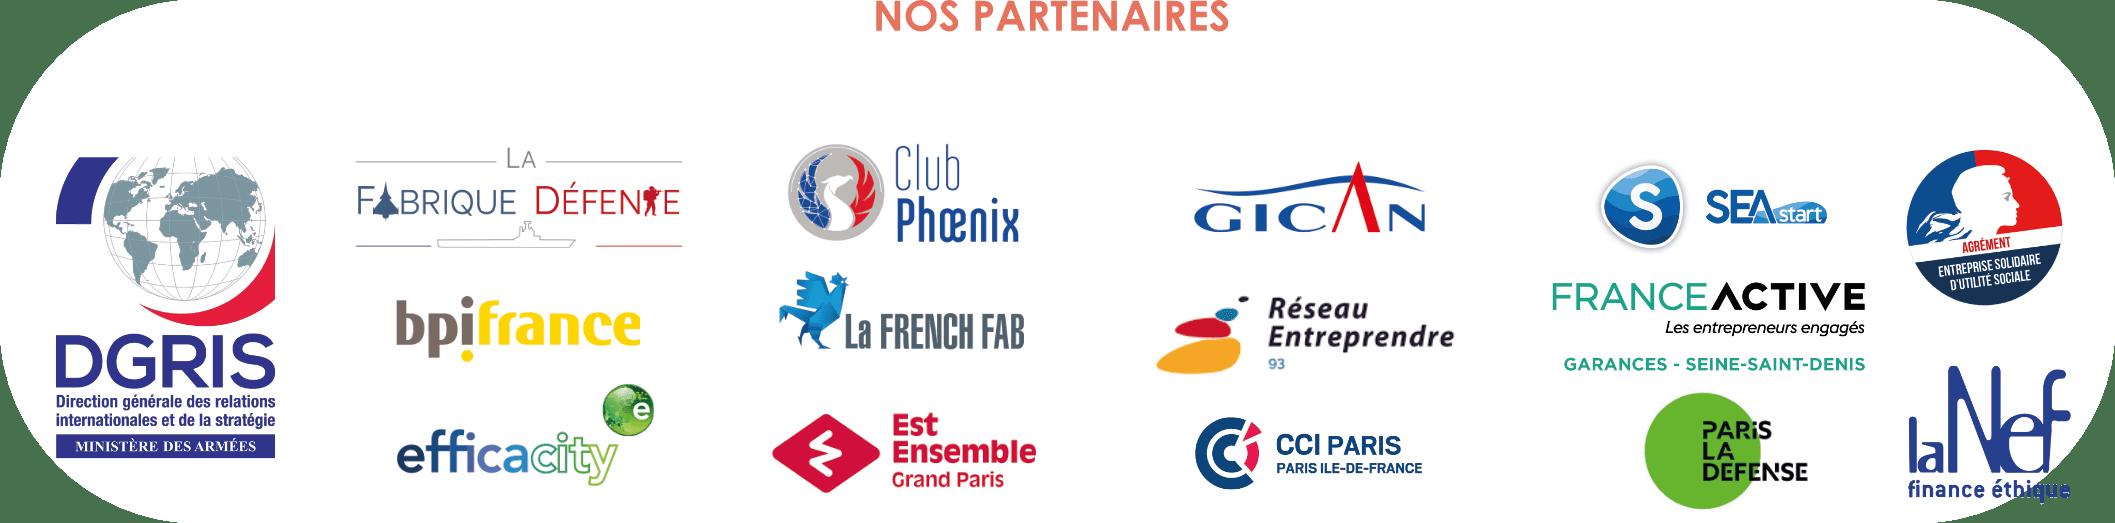 Olenergies Partenaires